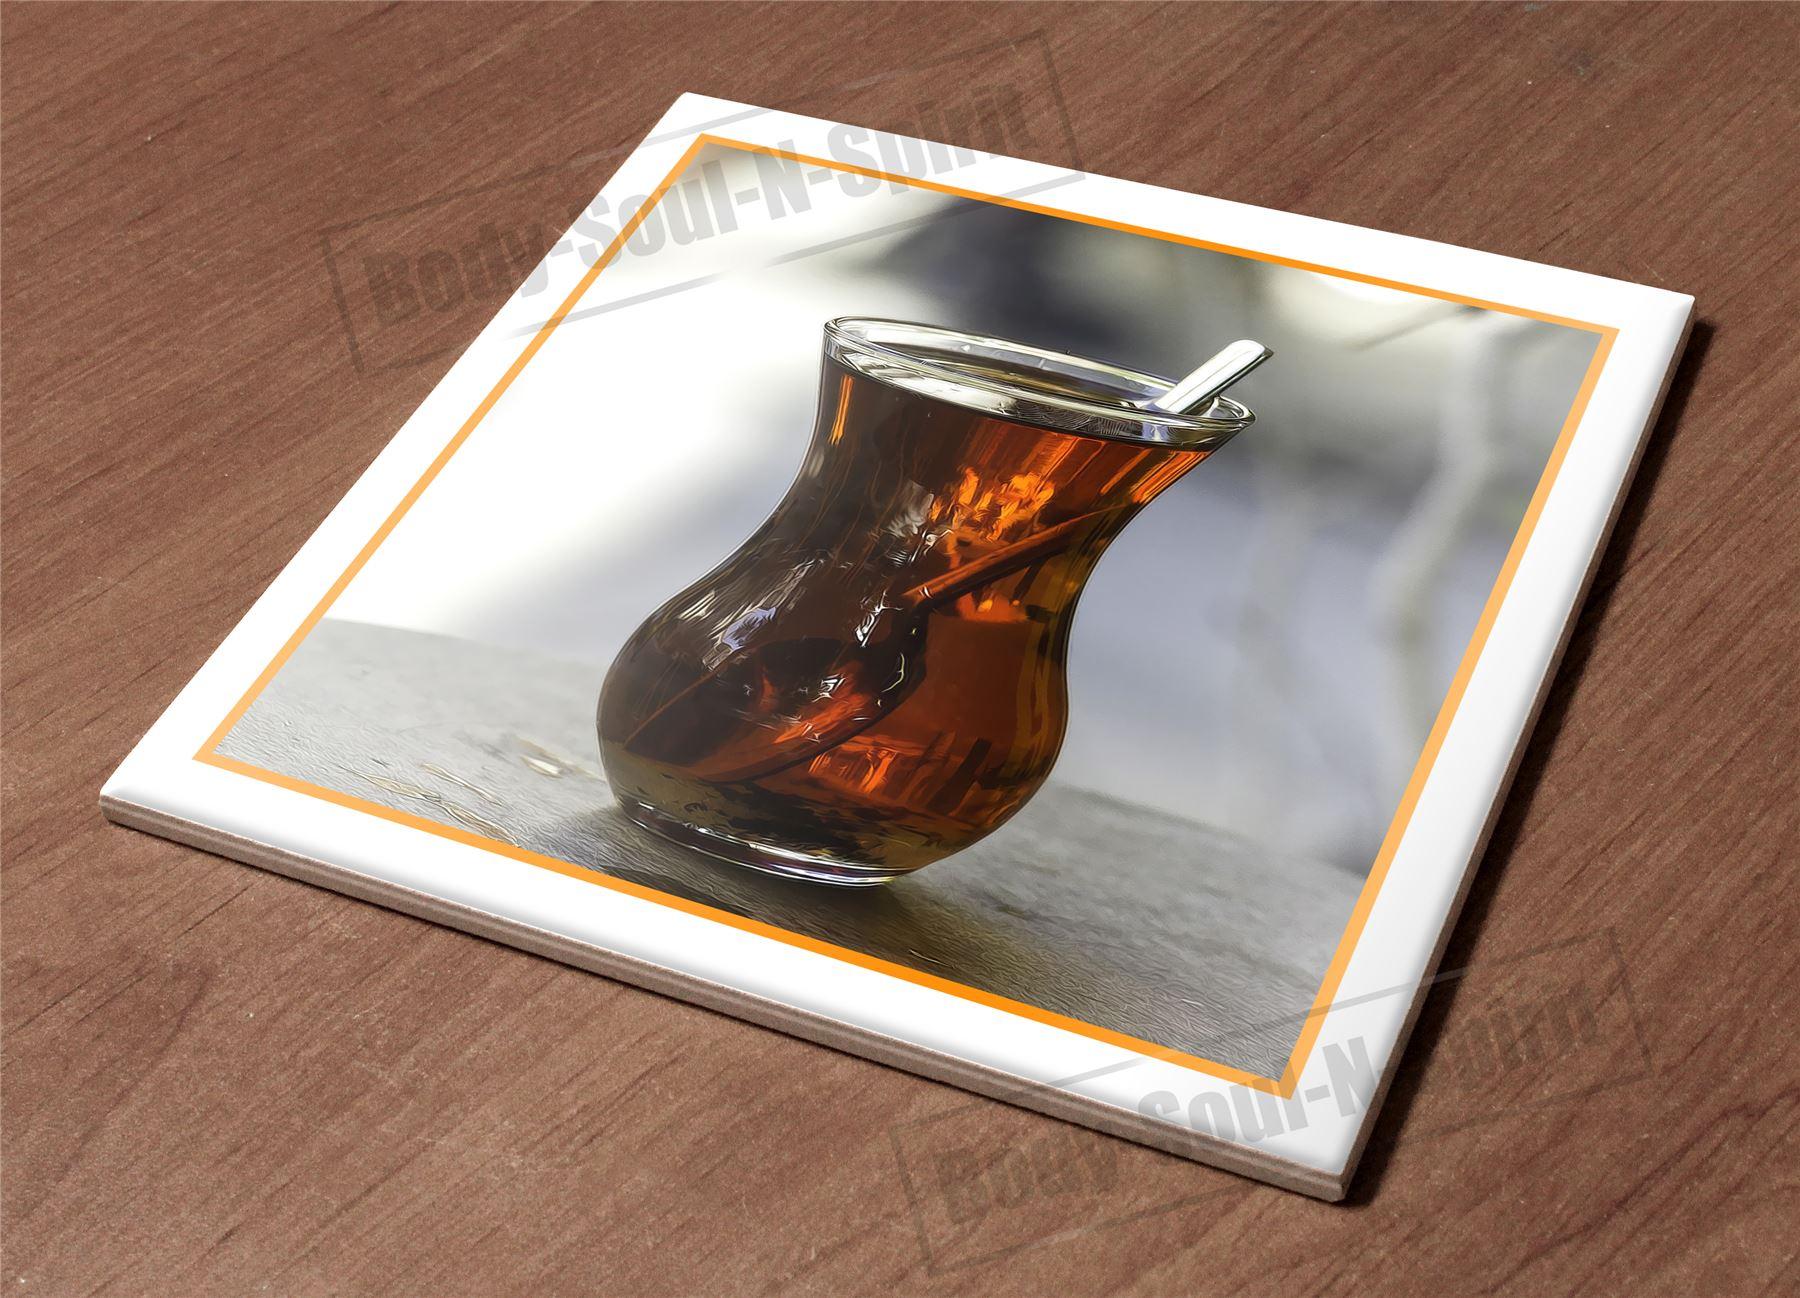 Tableware Serving Linen Kitchen Trivet Holder Ceramic Tile Hot Plate English Tea Glass Cup Decor Design Home Furniture Diy Tohoku Morinagamilk Co Jp